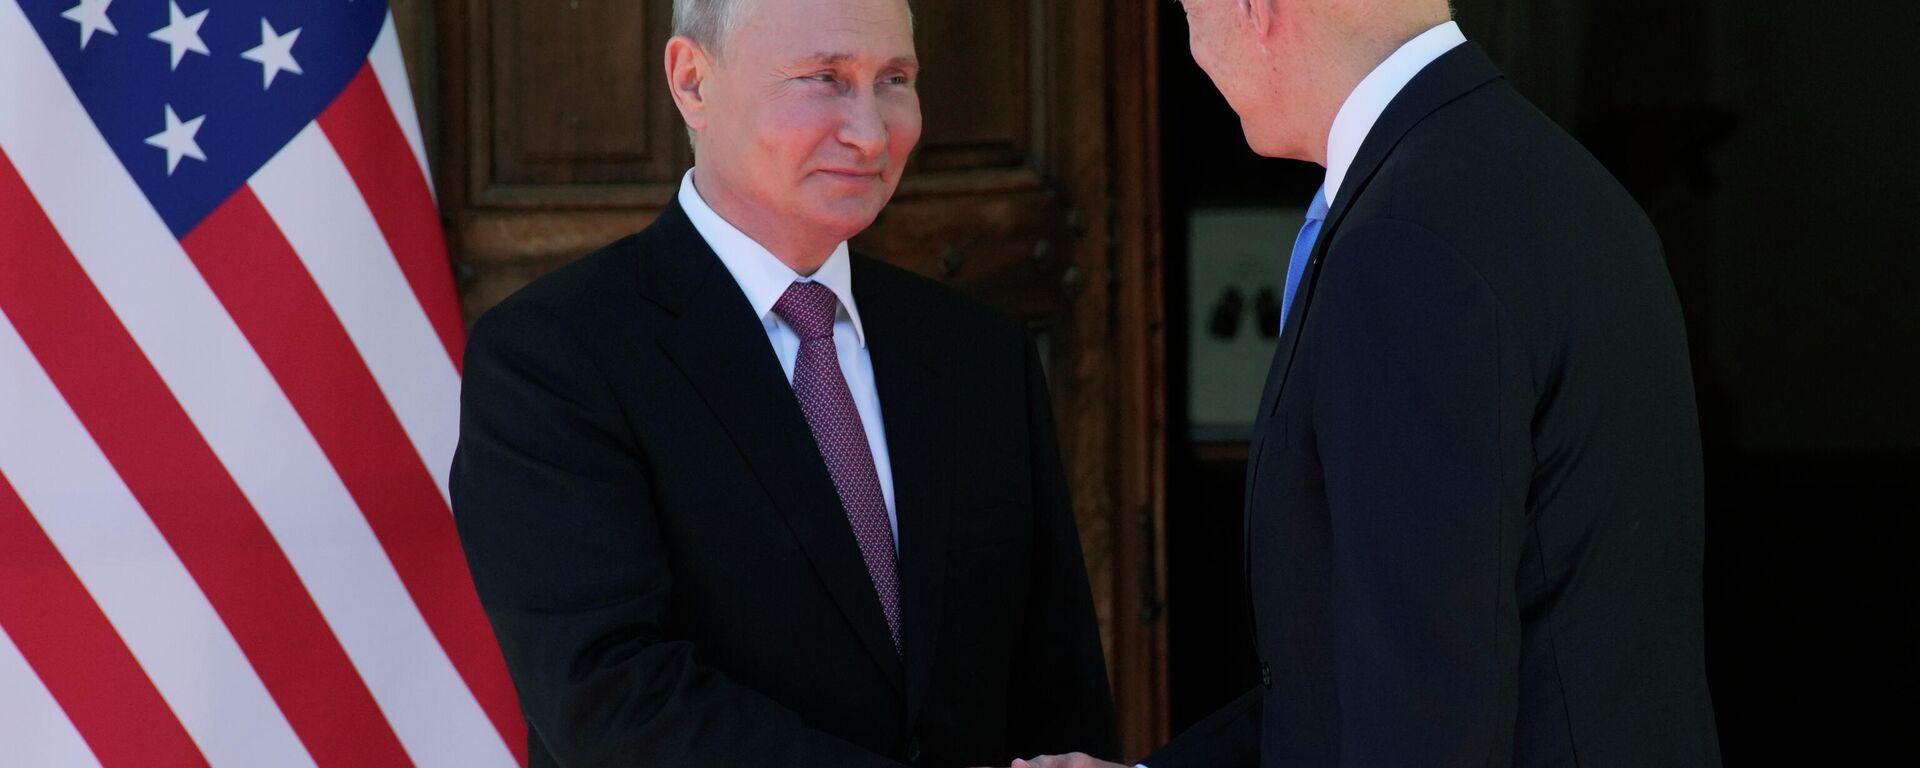 Рукопожатие президента России Владимира Путина и президента США Джо Байдена - Sputnik Таджикистан, 1920, 29.06.2021